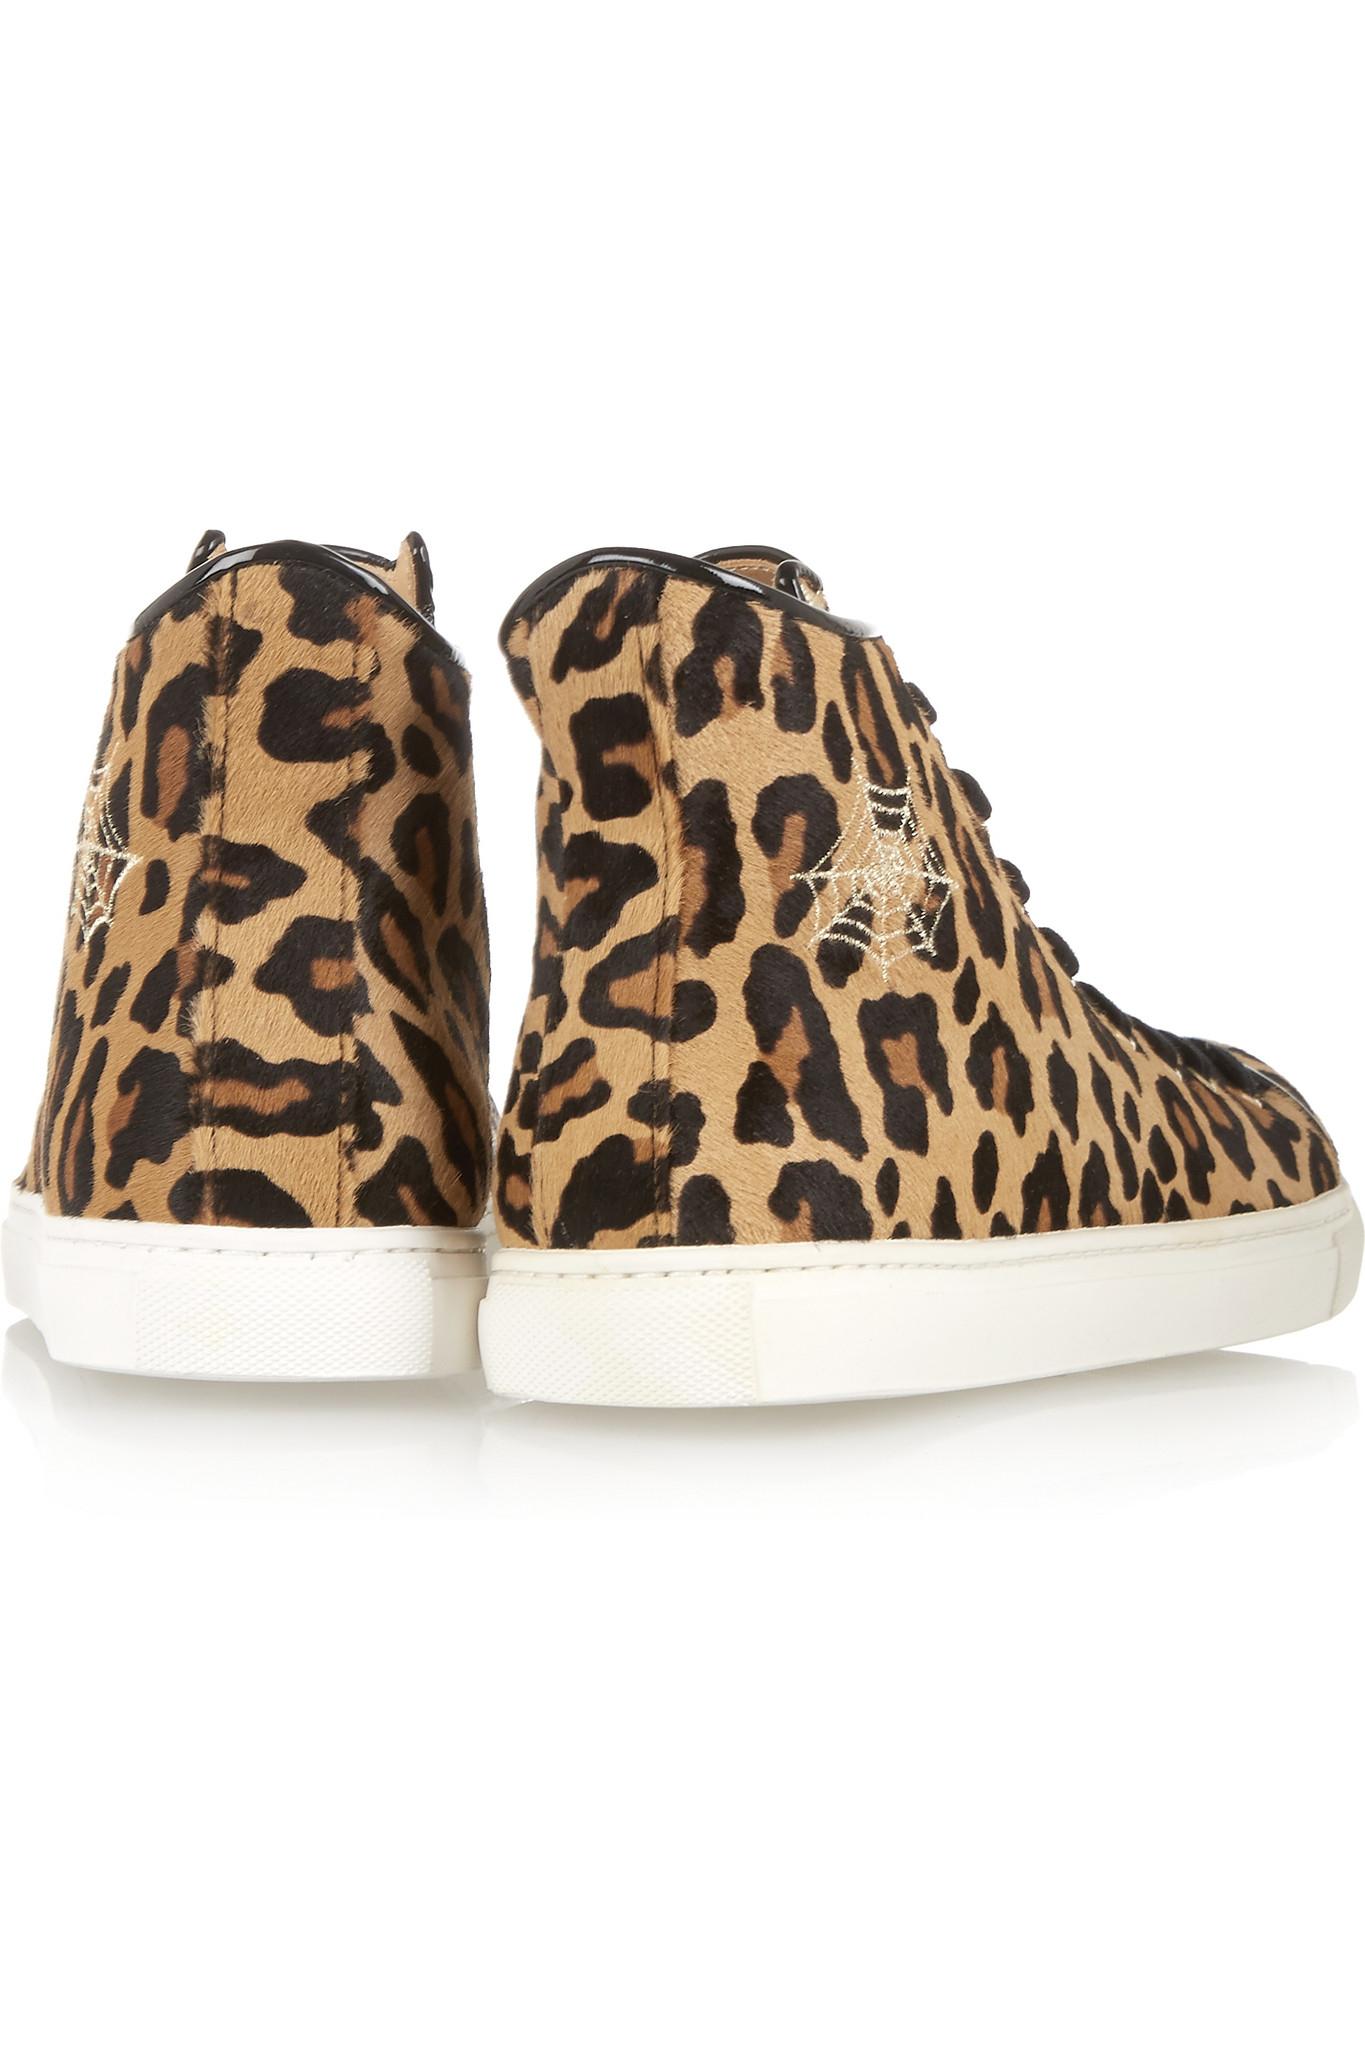 46d34b19ae99 Charlotte Olympia Purrrfect Leopard-print Calf Hair High-top Sneakers - Lyst